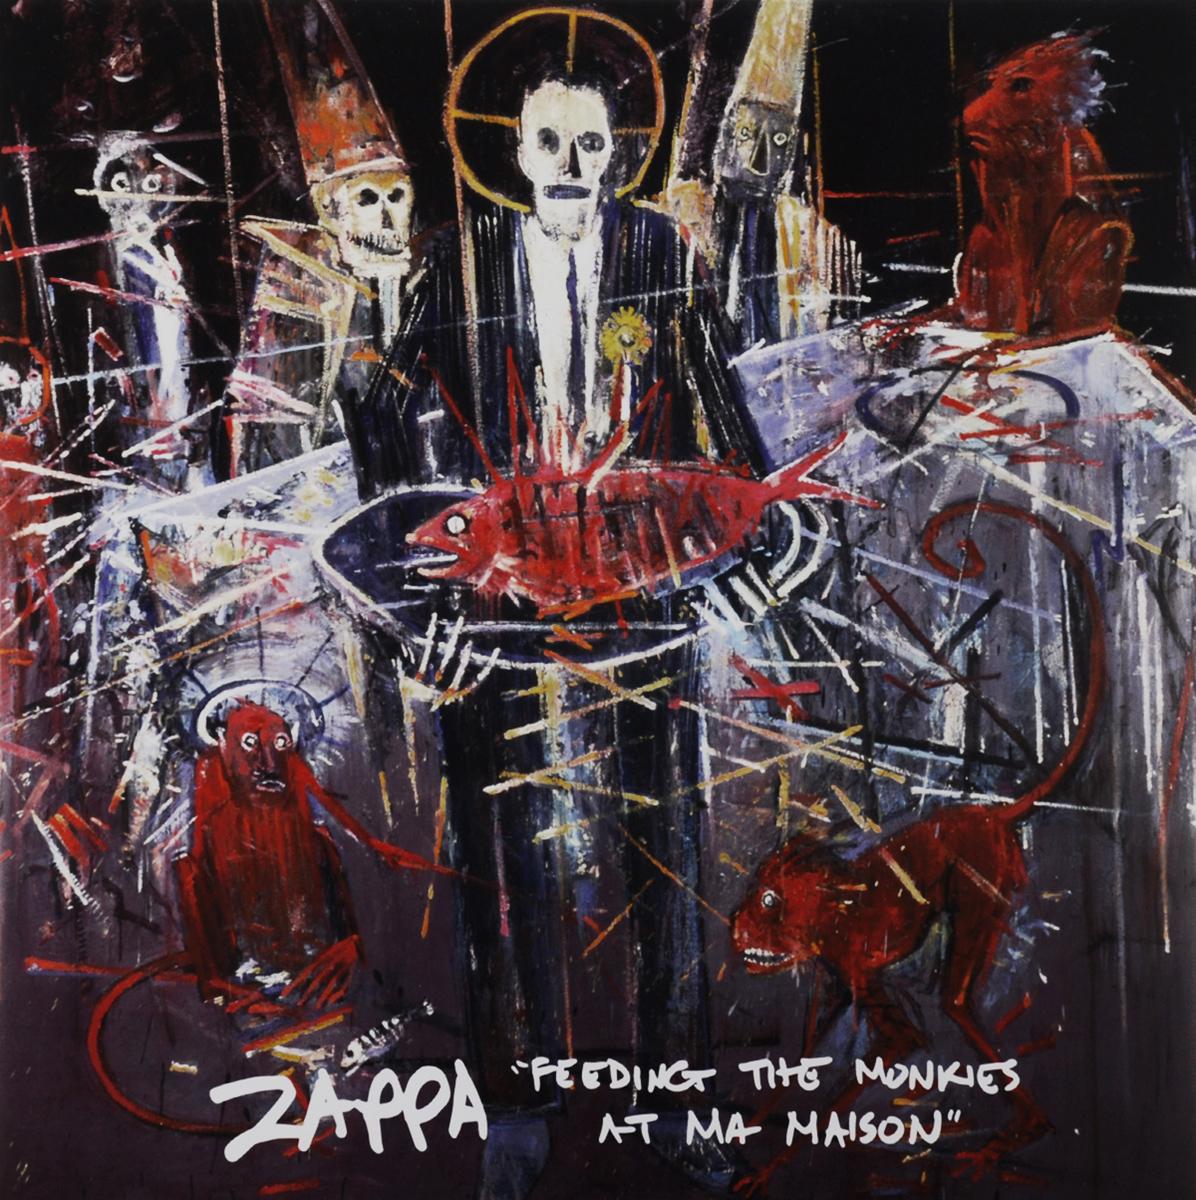 лучшая цена Фрэнк Заппа Frank Zappa. Feeding The Monkies At Ma Maison (LP)